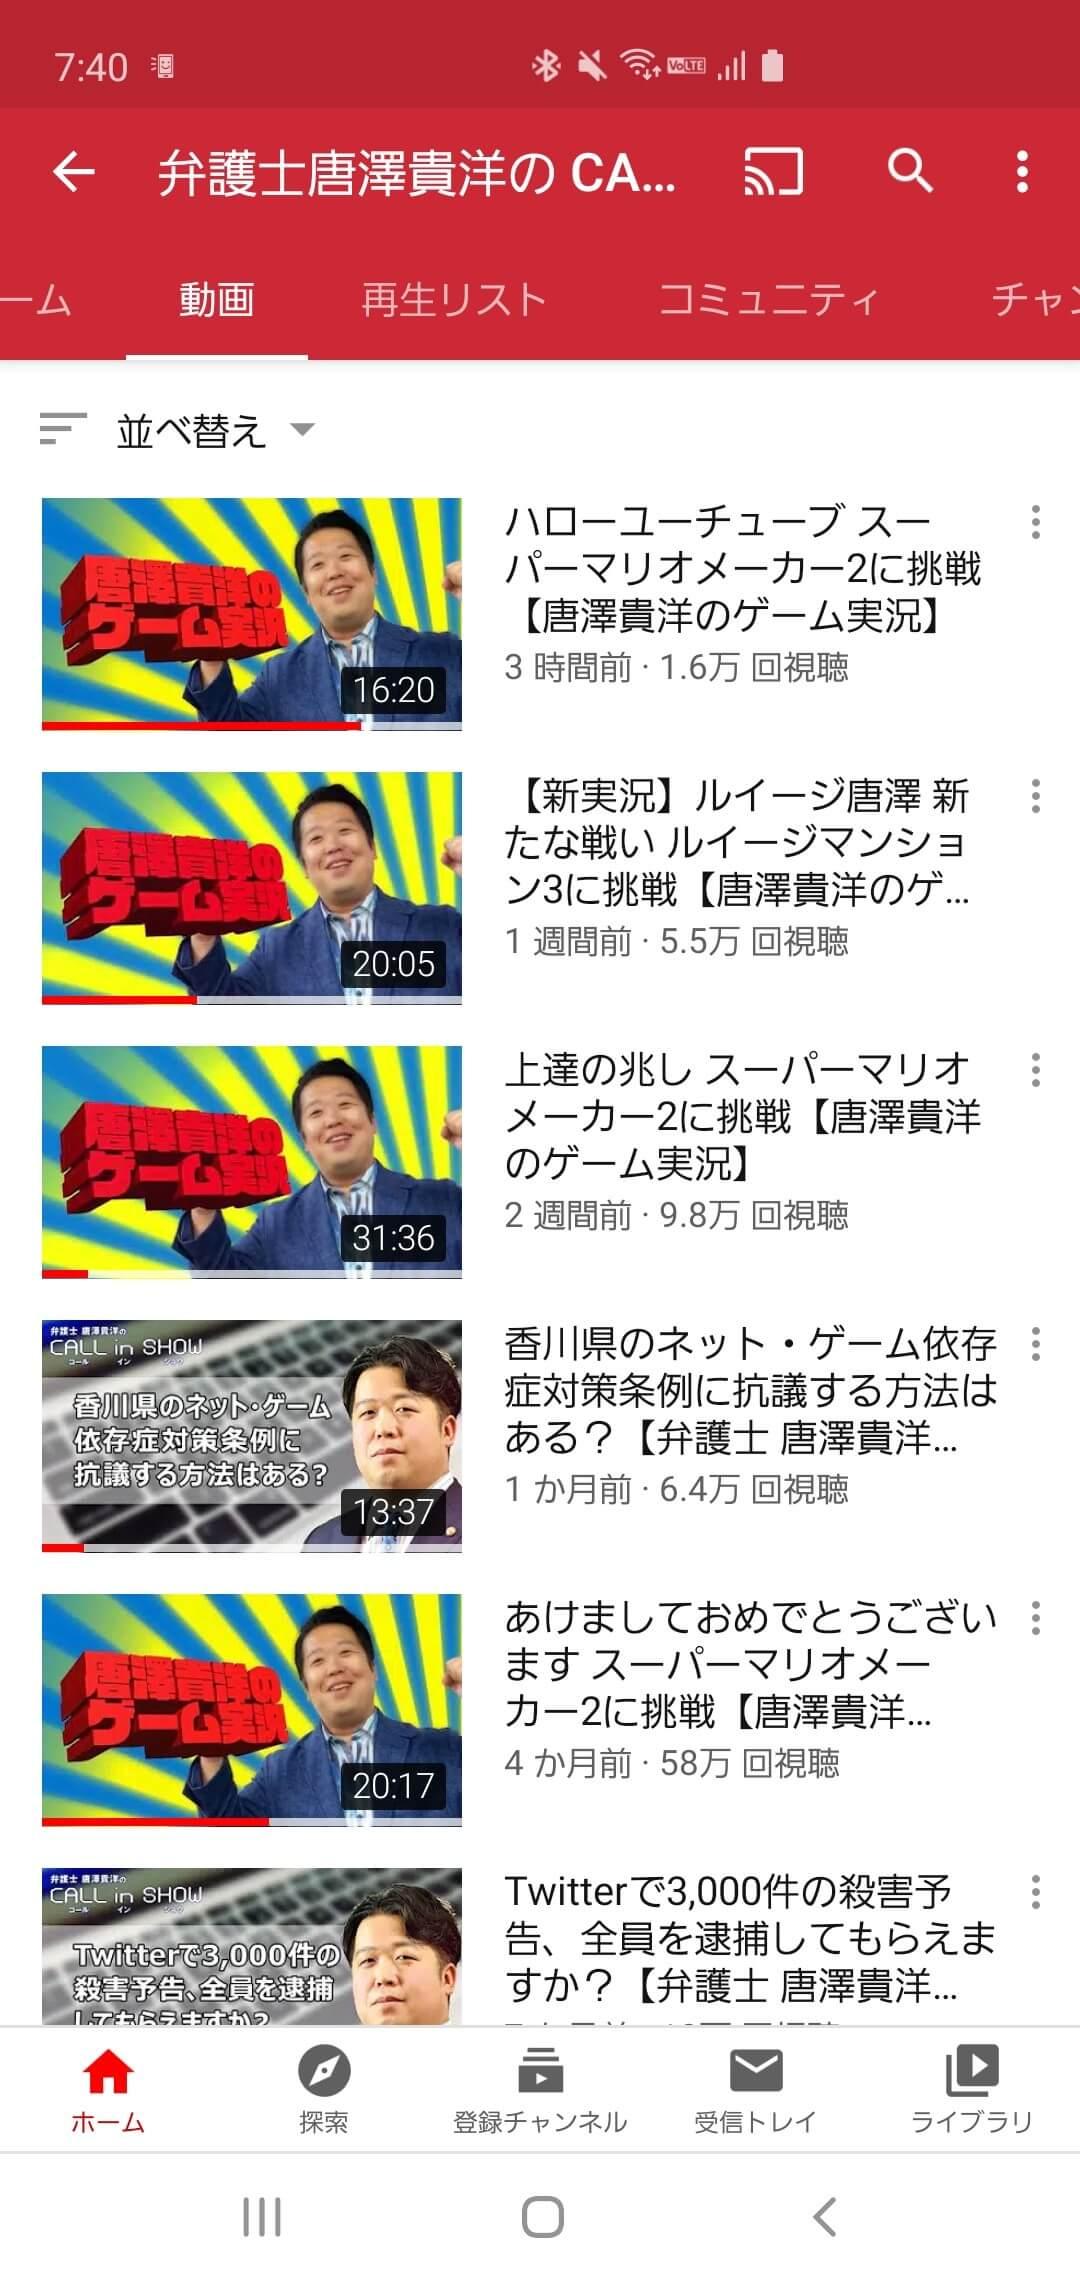 唐沢 貴洋 youtube